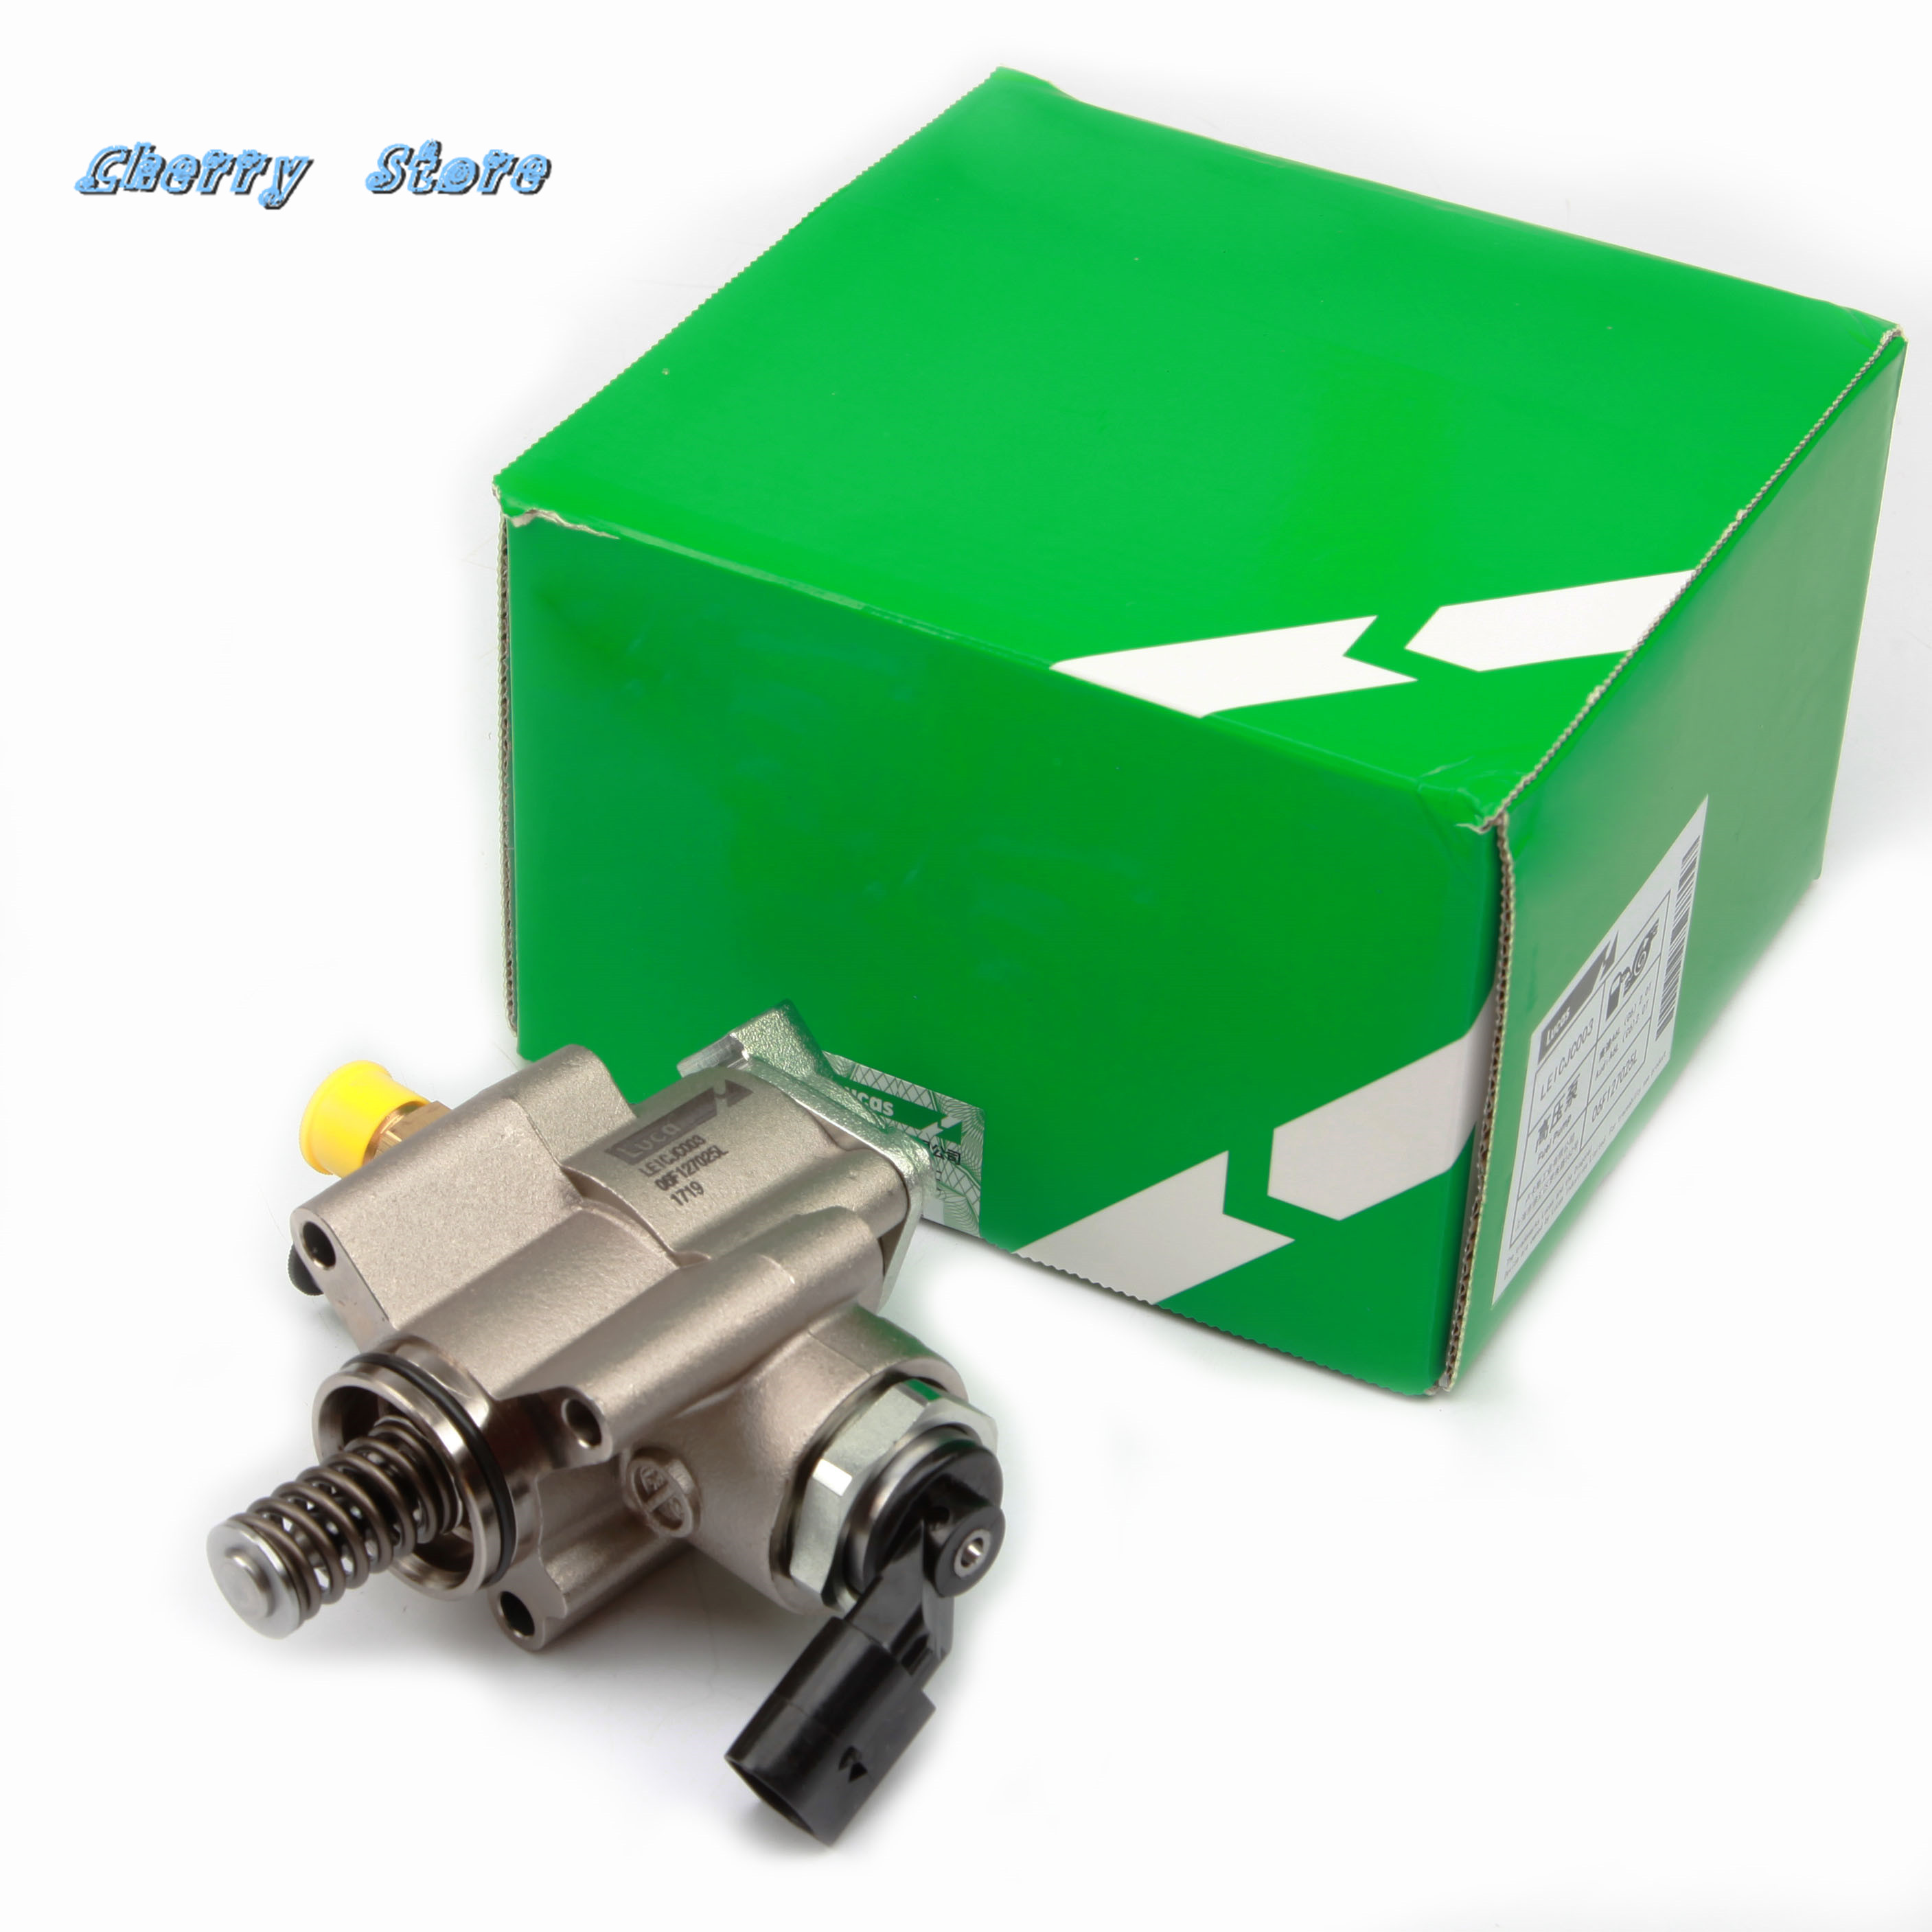 NEW 06F 127 025 K Mechanical High Pressure Fuel Pump For Audi A3 A4 A6 TT